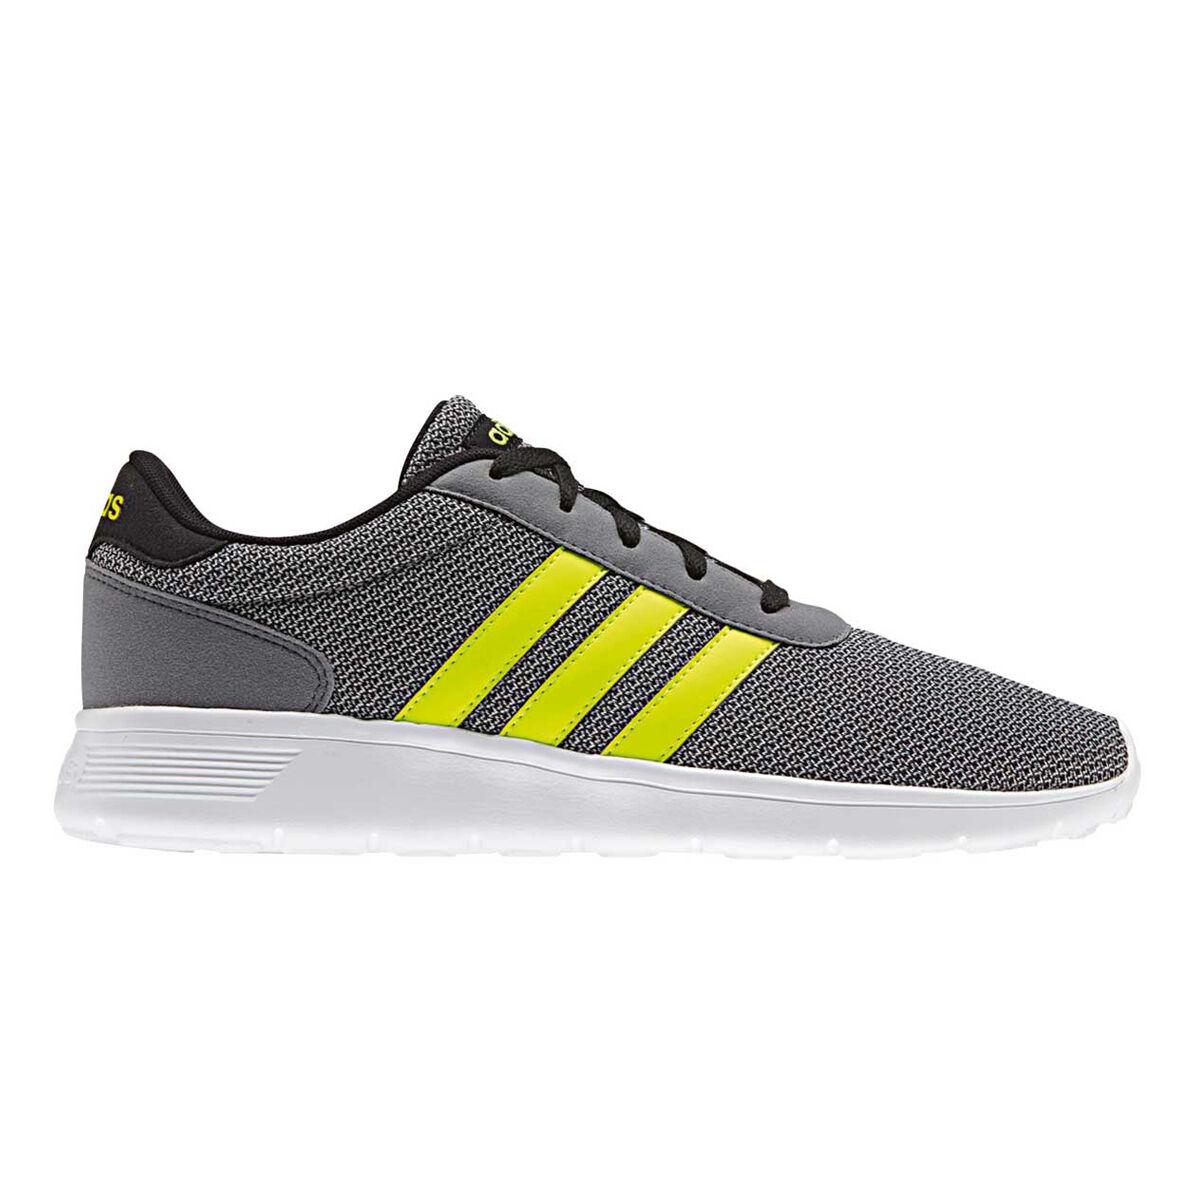 uk adidas casual shoes black yellow 0777f 65fb9